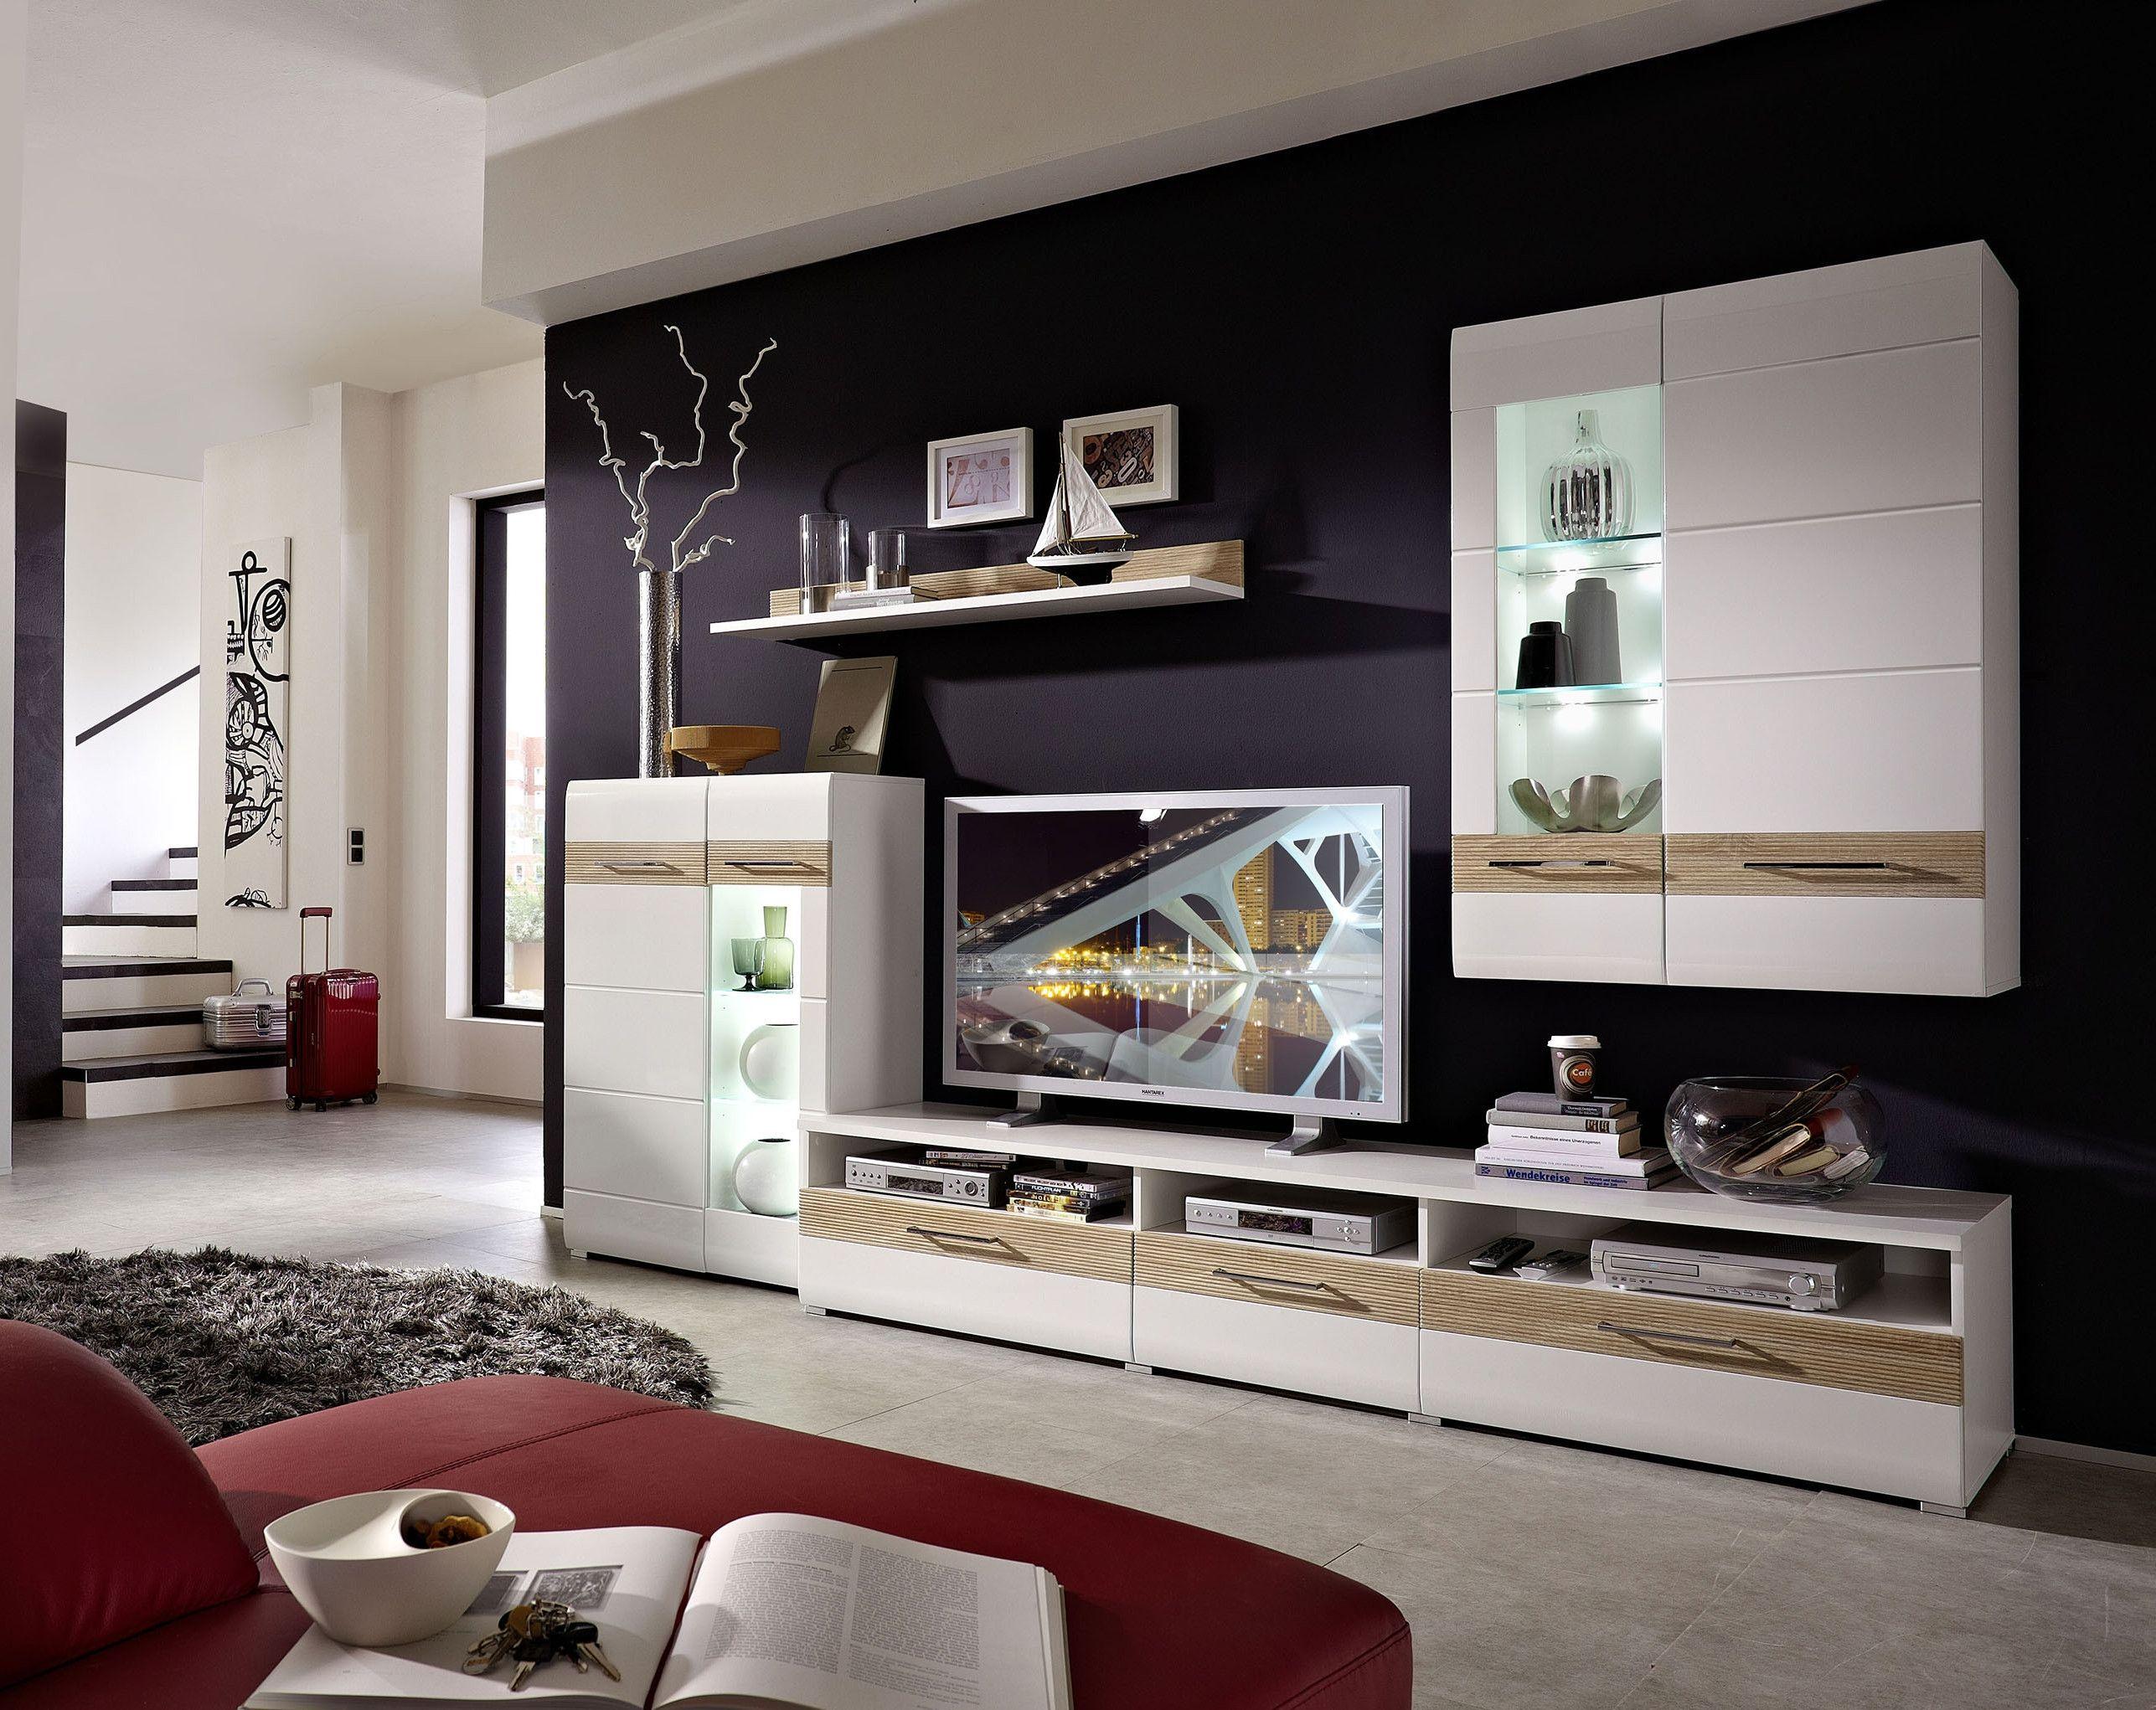 Wohnwand Angebot Fotos : Nett wohnwand angebot deutsche deko angebote